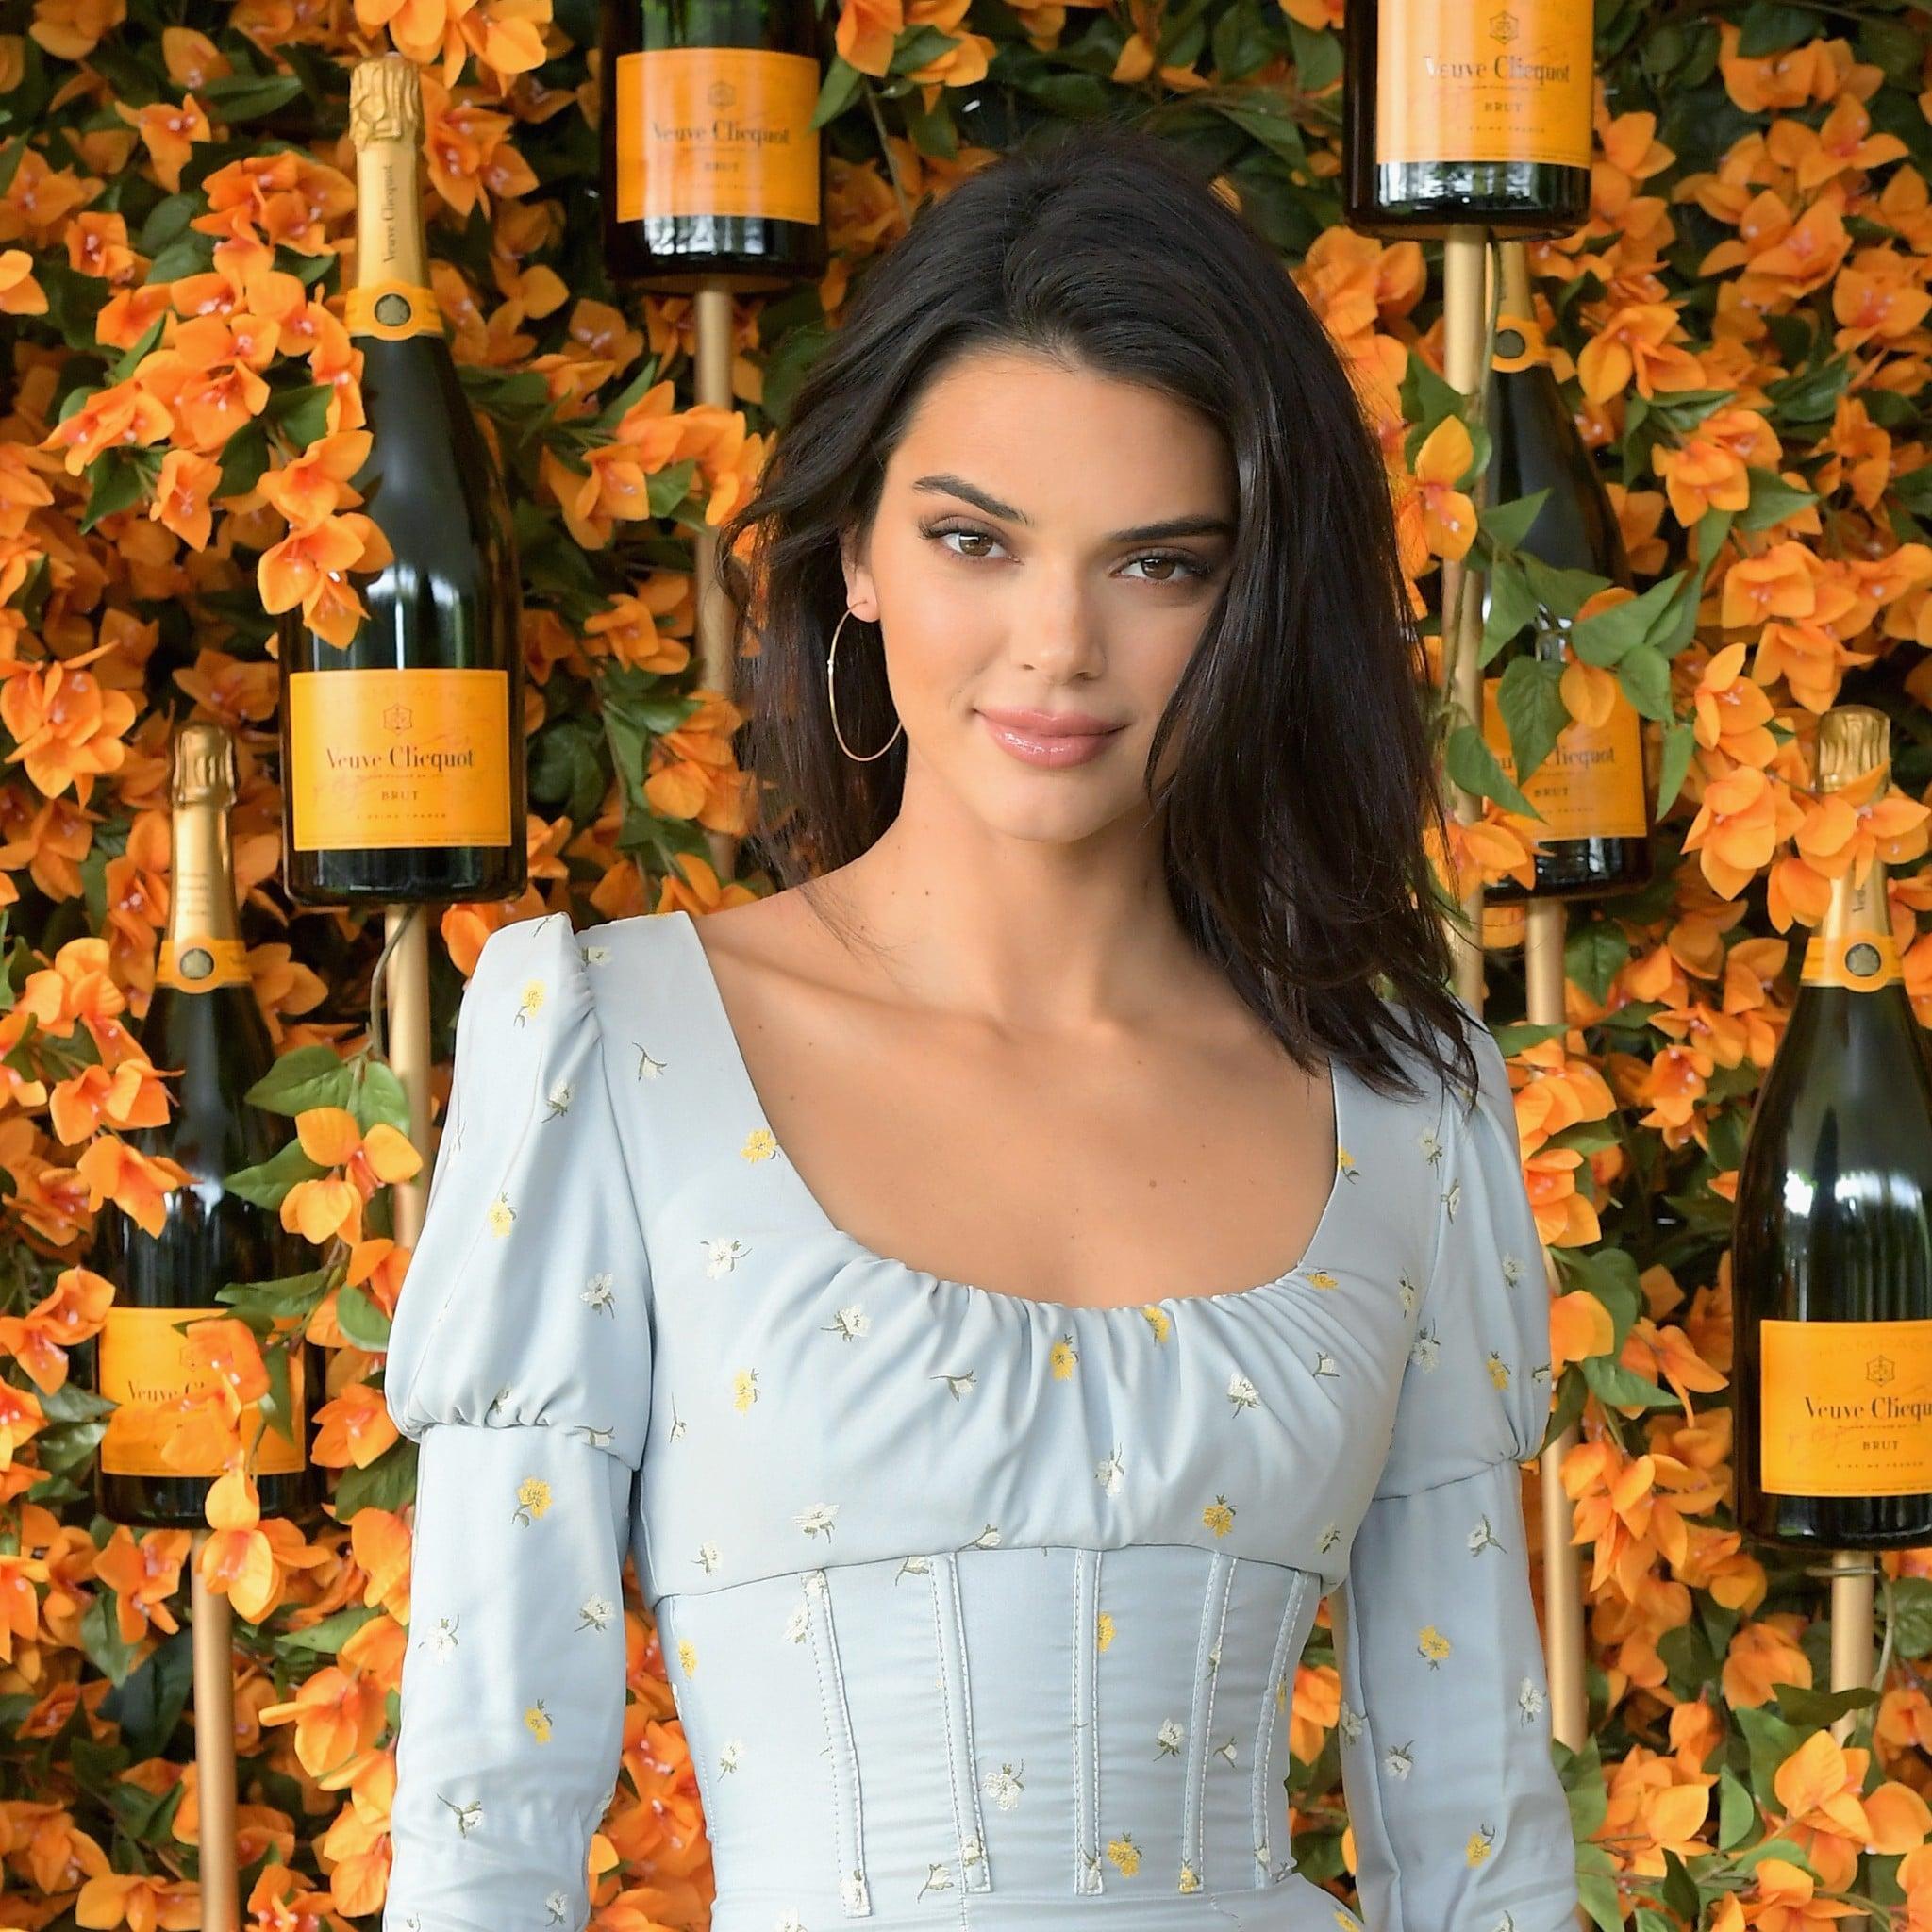 b4c8b6260567 Kendall Jenner s Blue Corset Dress October 2018